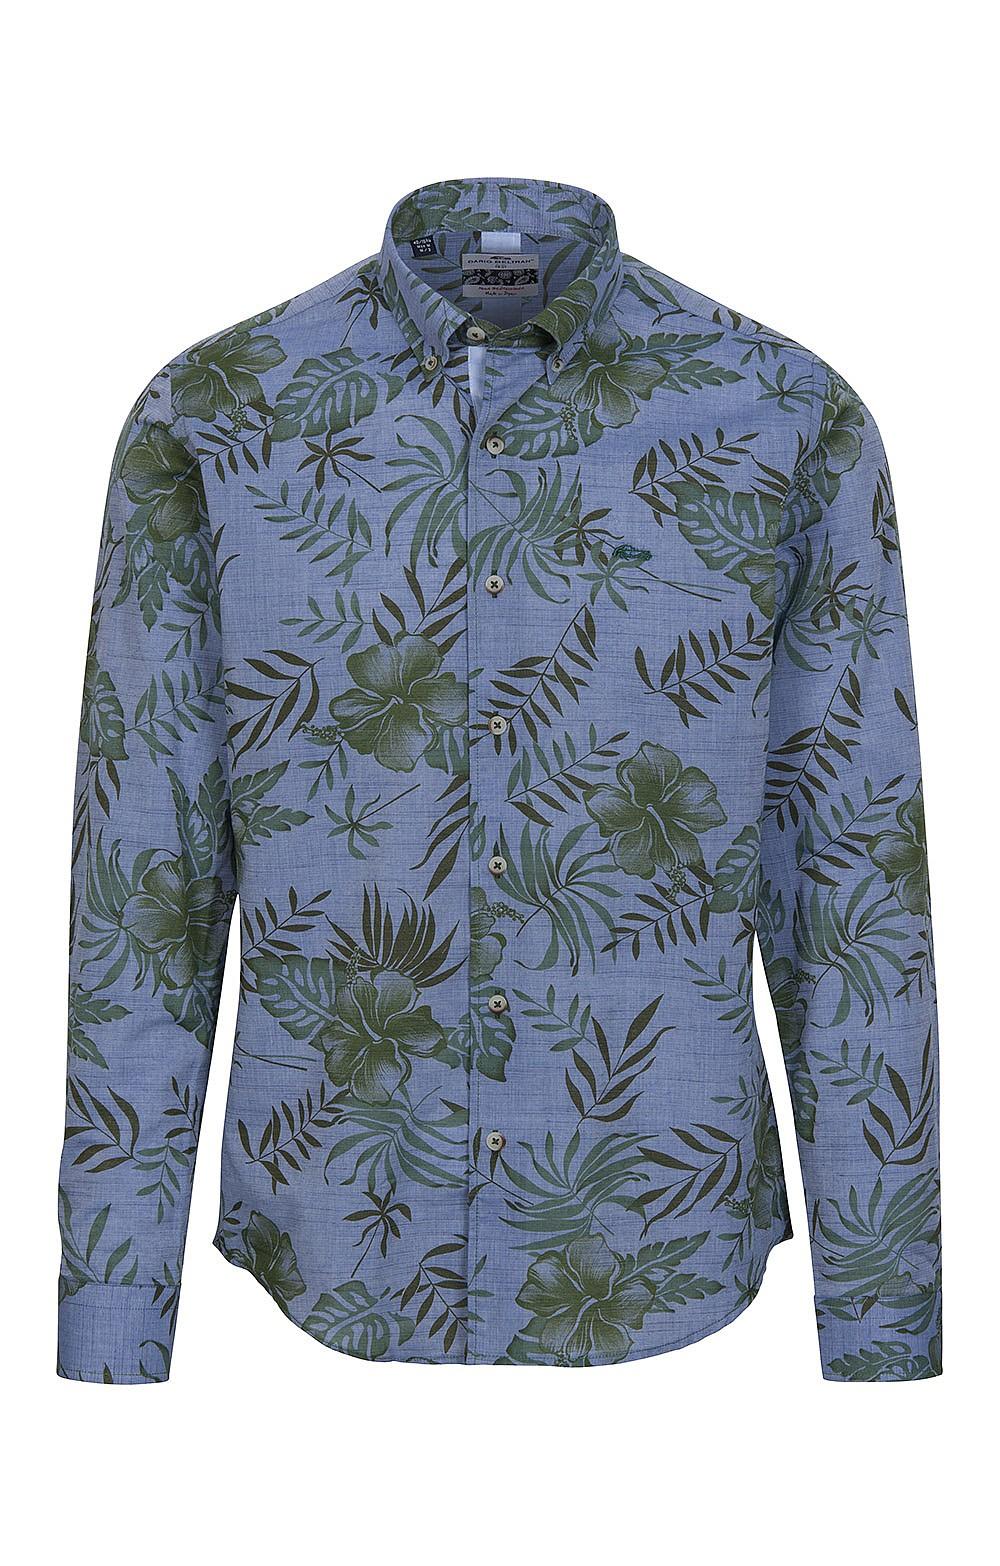 8c75a7ceb411d0 Men's Dario Beltran Long Sleeve Printed Cotton Shirt - House of Bruar